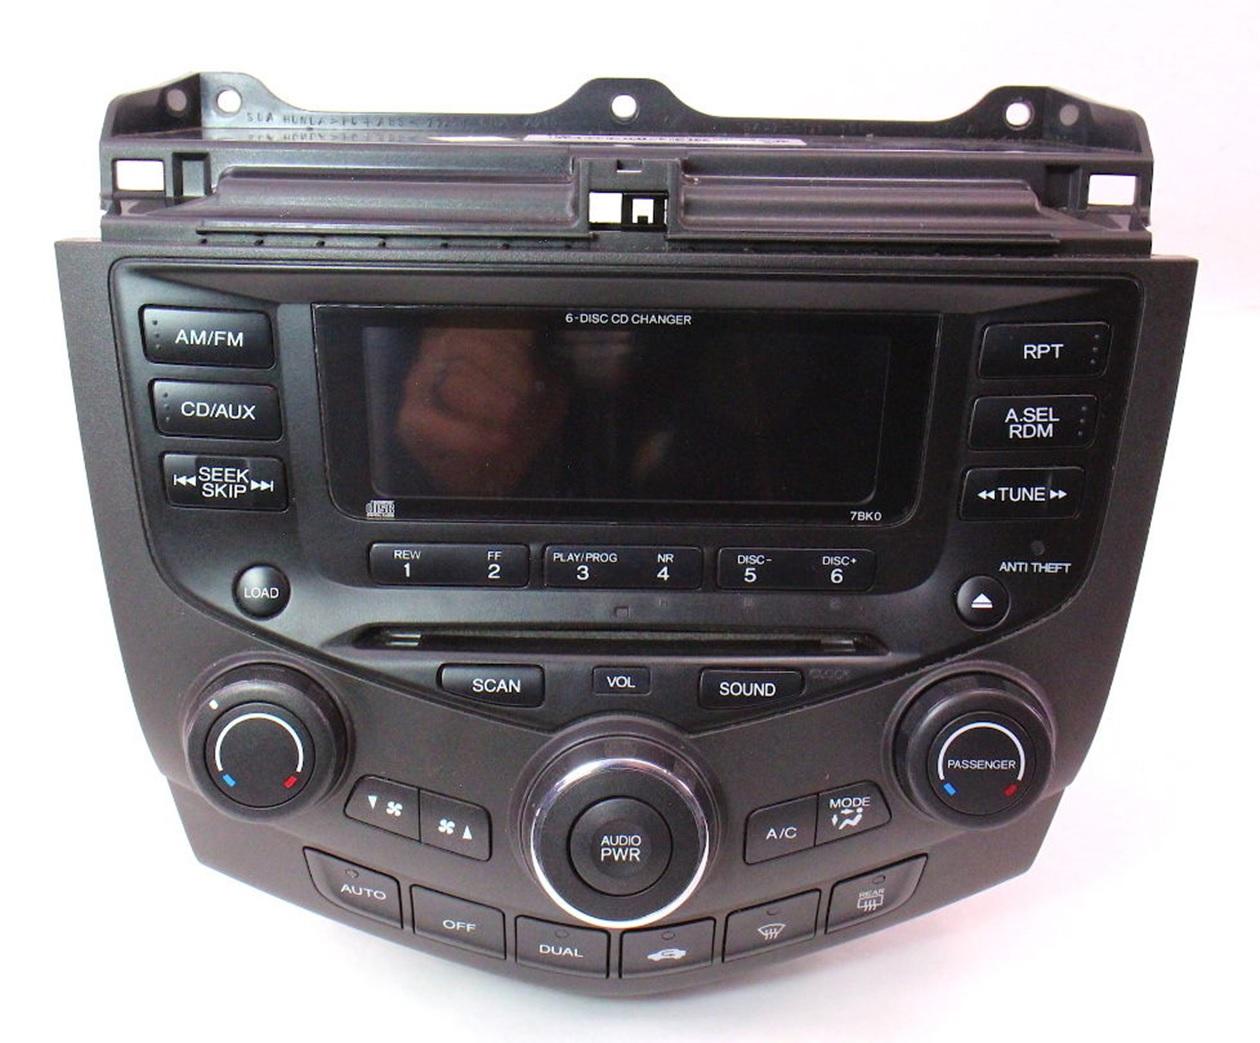 Honda-Accord-2003-2004-Radio-Climate-Control-Dead-Dim-Repair-SKU-6716